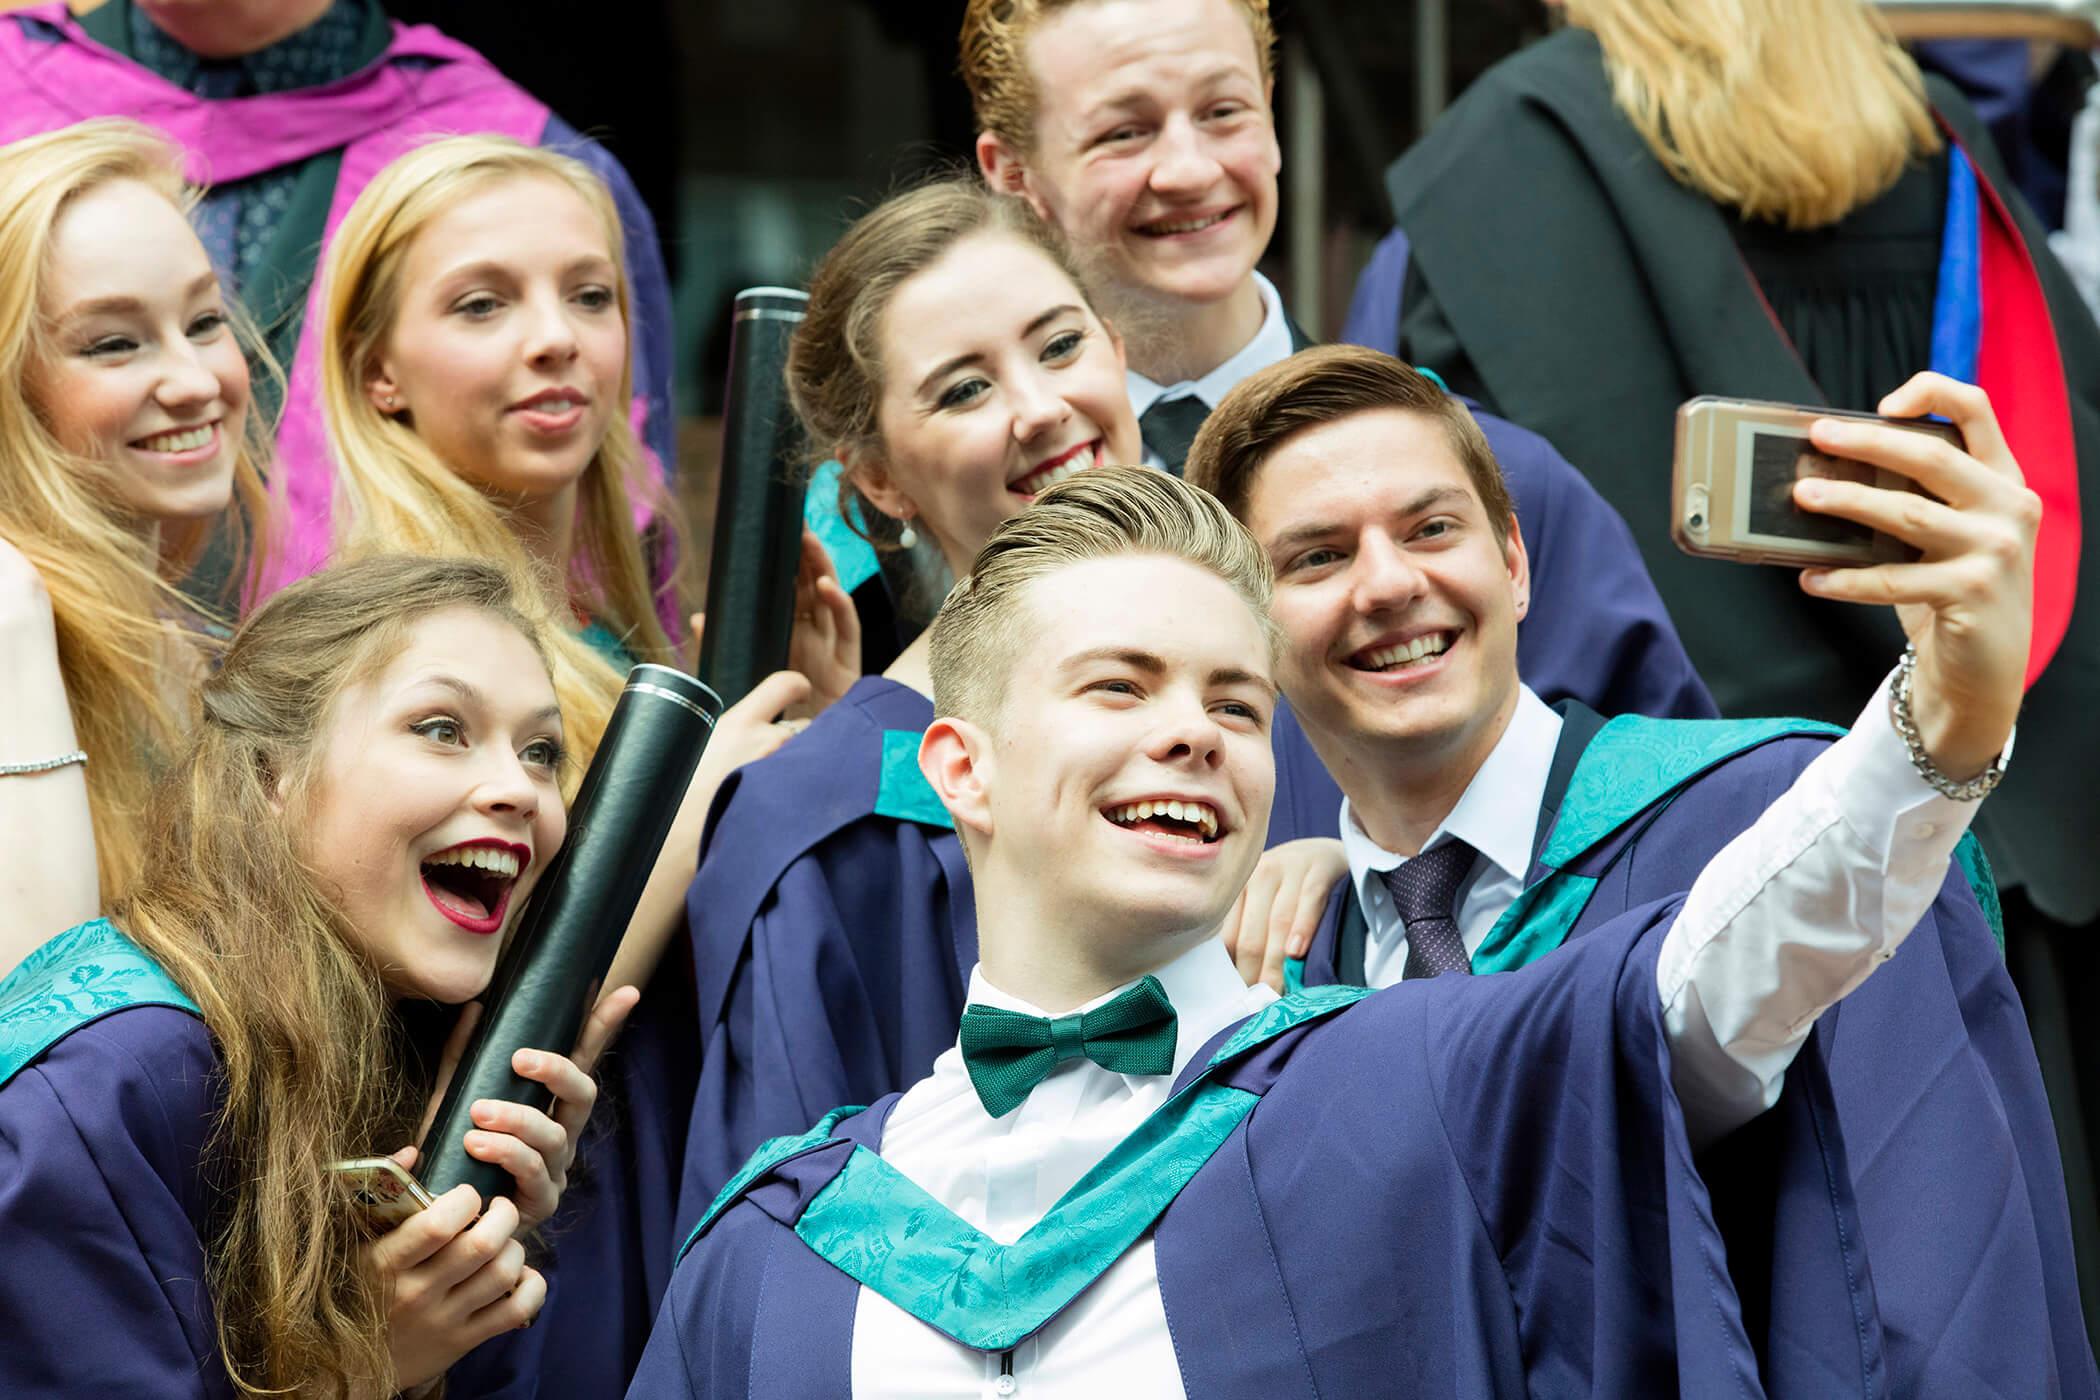 Royal Conservatoire of Scotland celebrates success in winter graduation Image